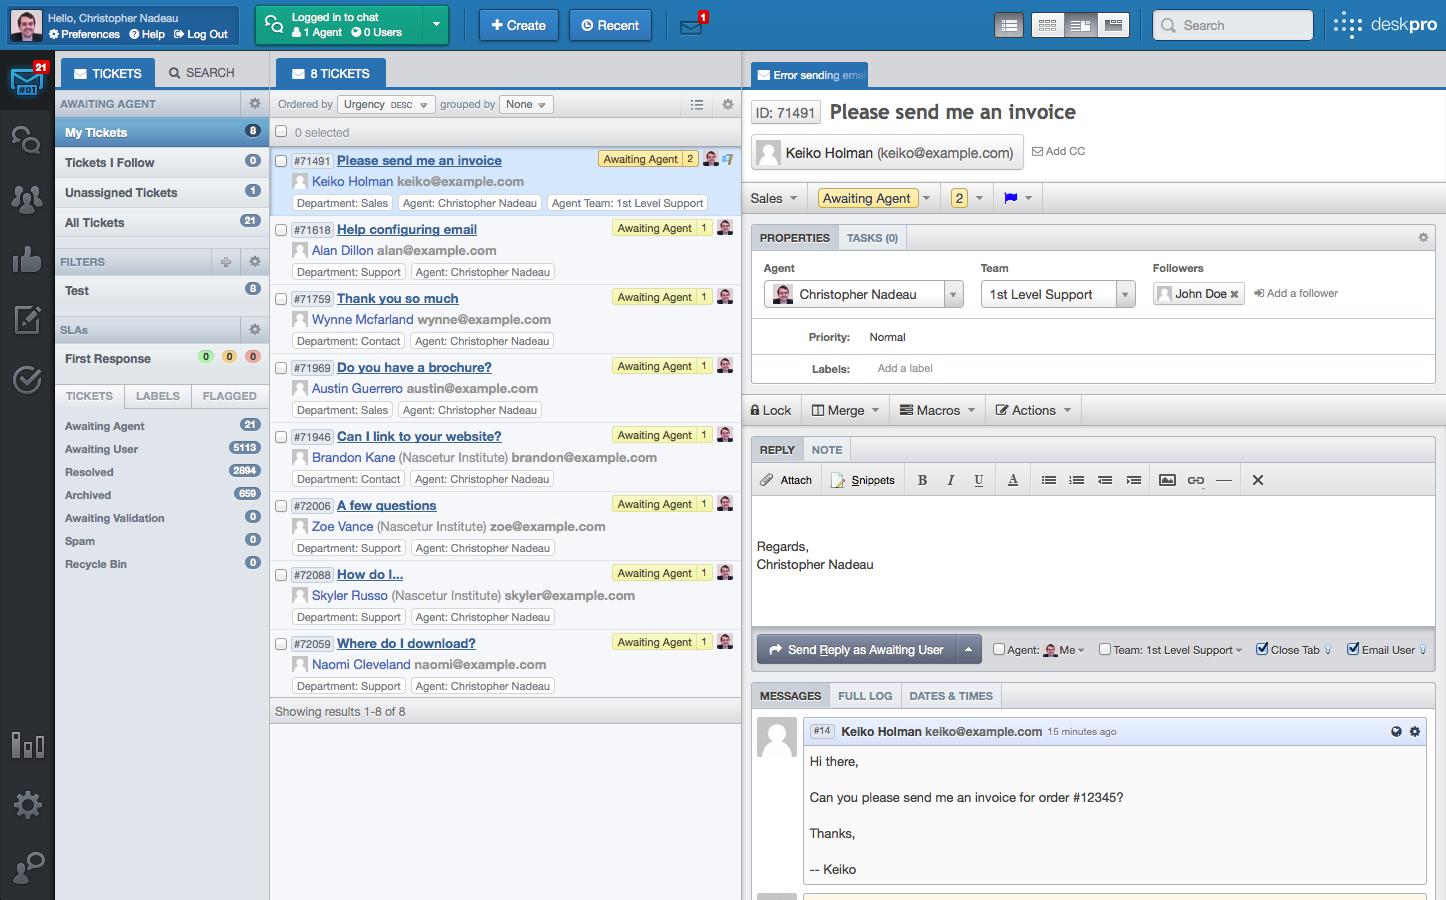 Image Gallery Help Desk Software